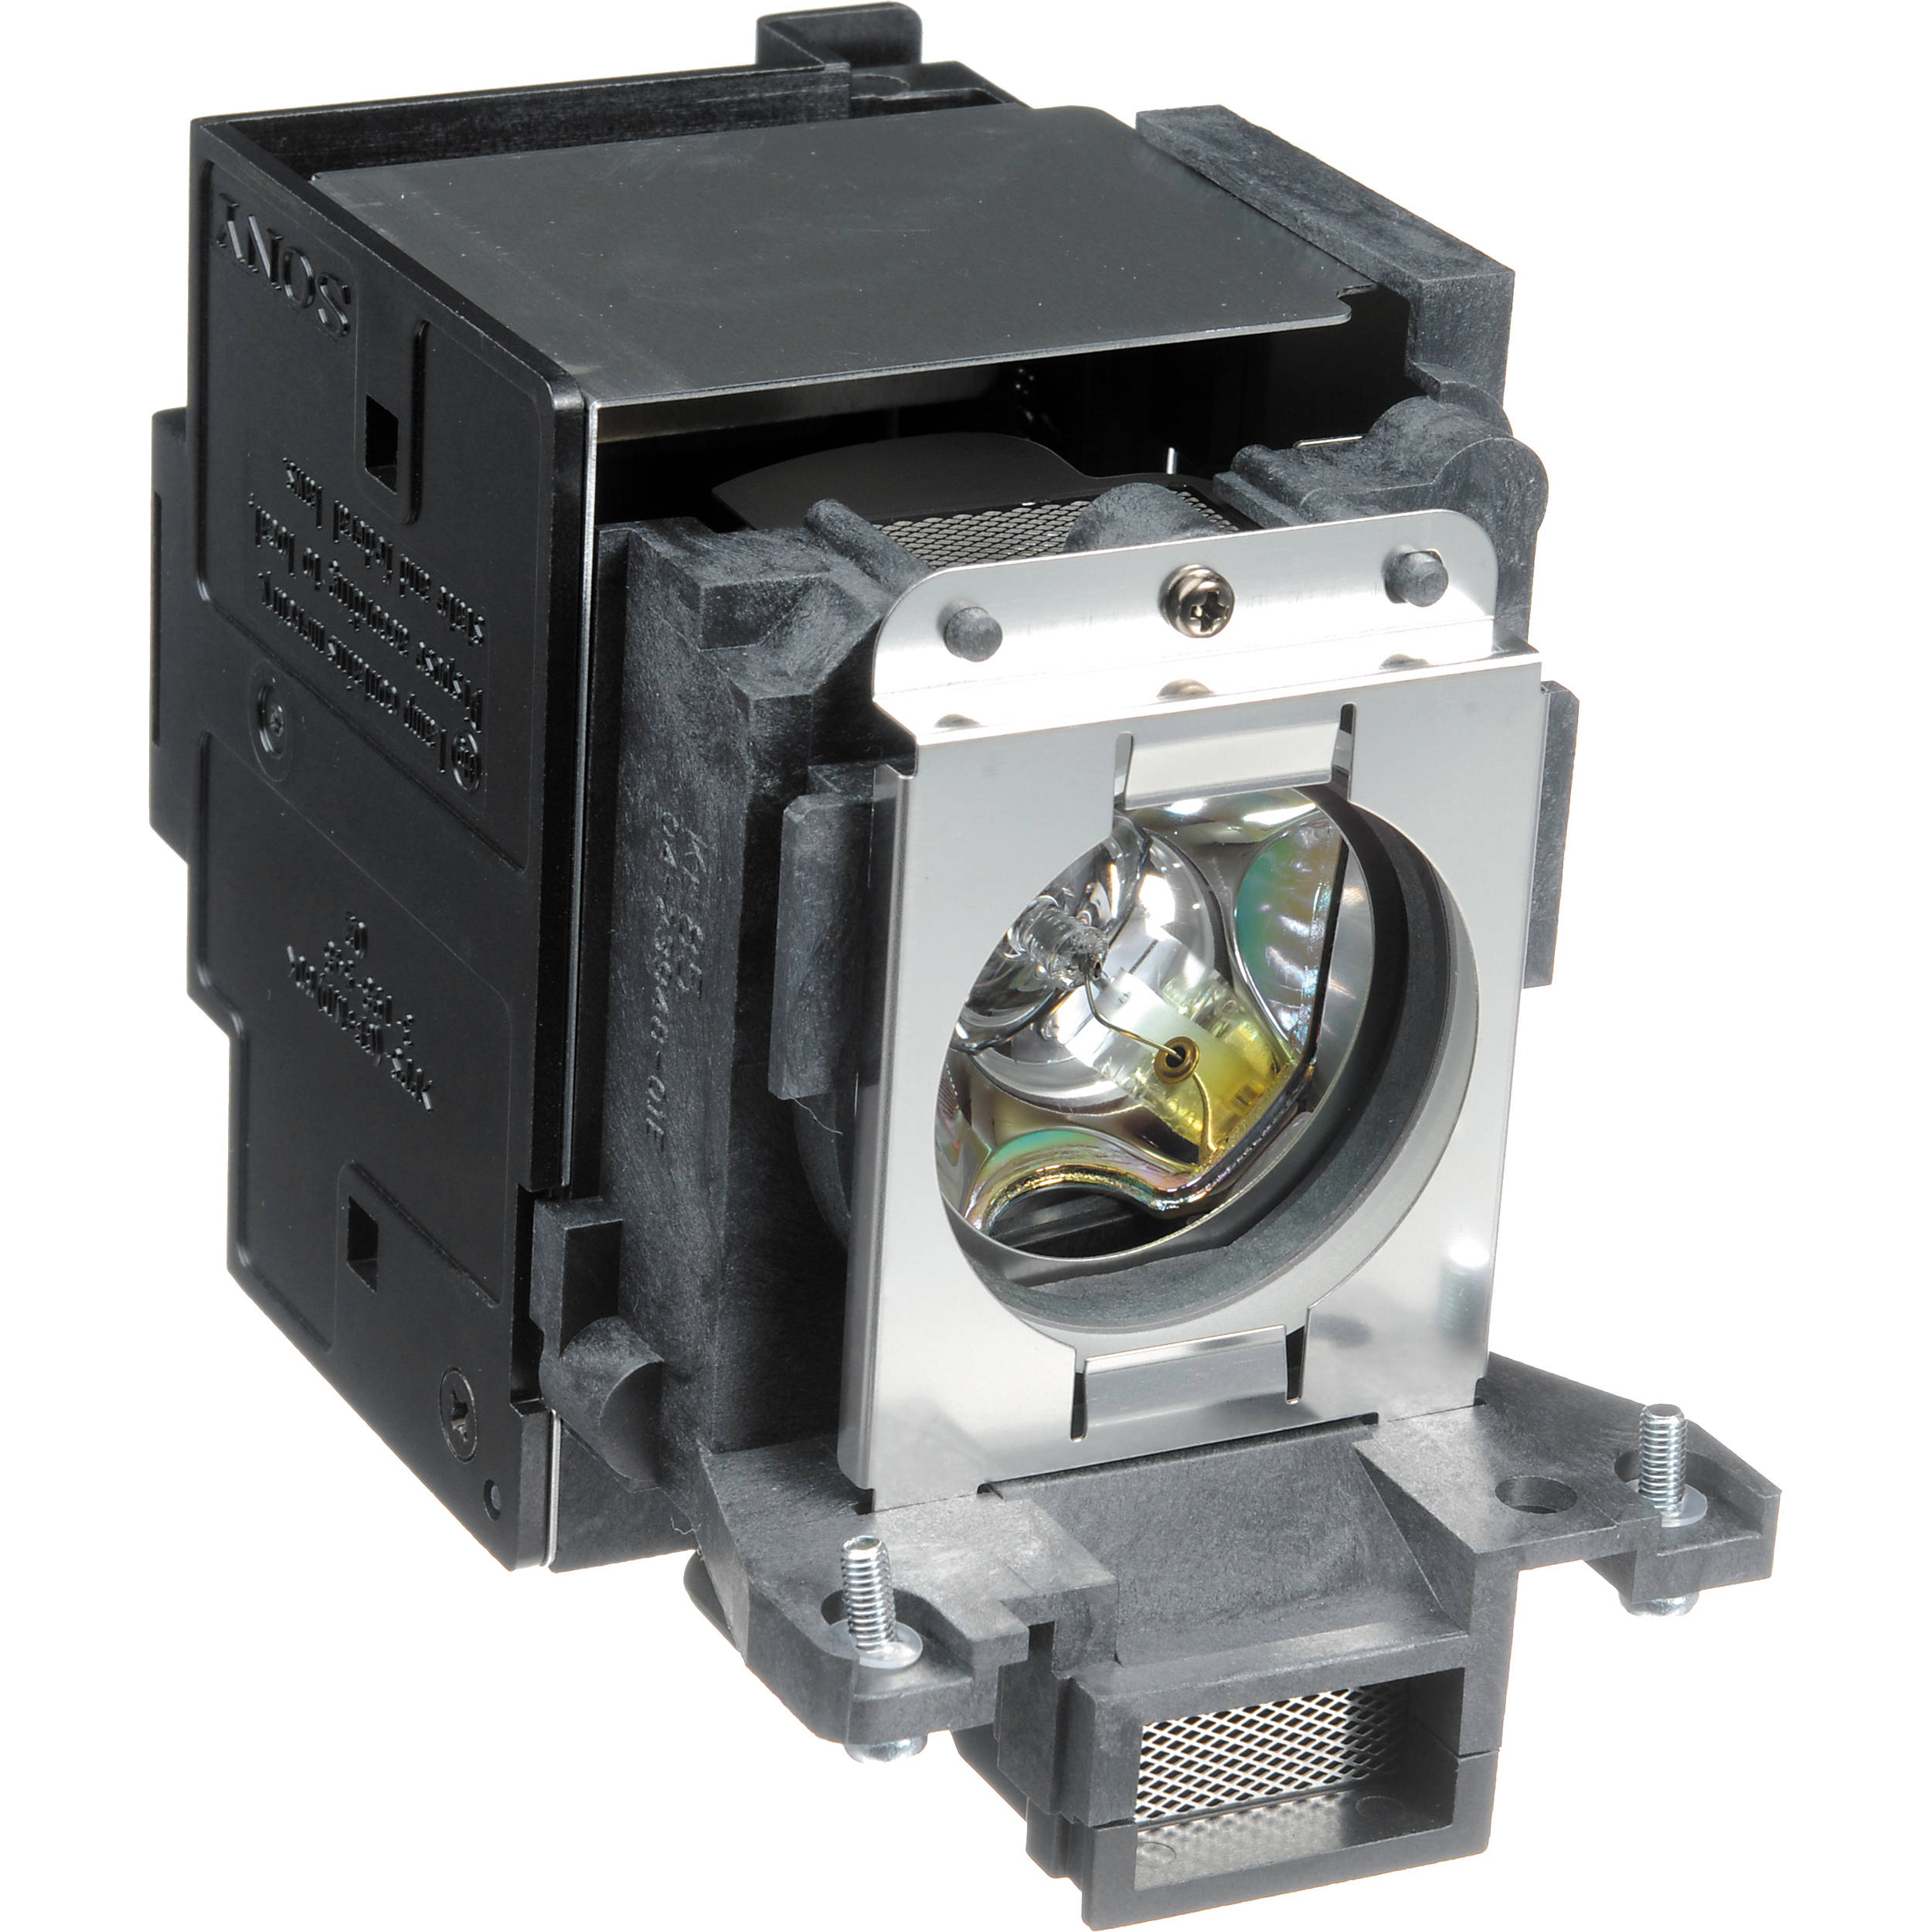 Sony LMP-C200 Projector Lamp